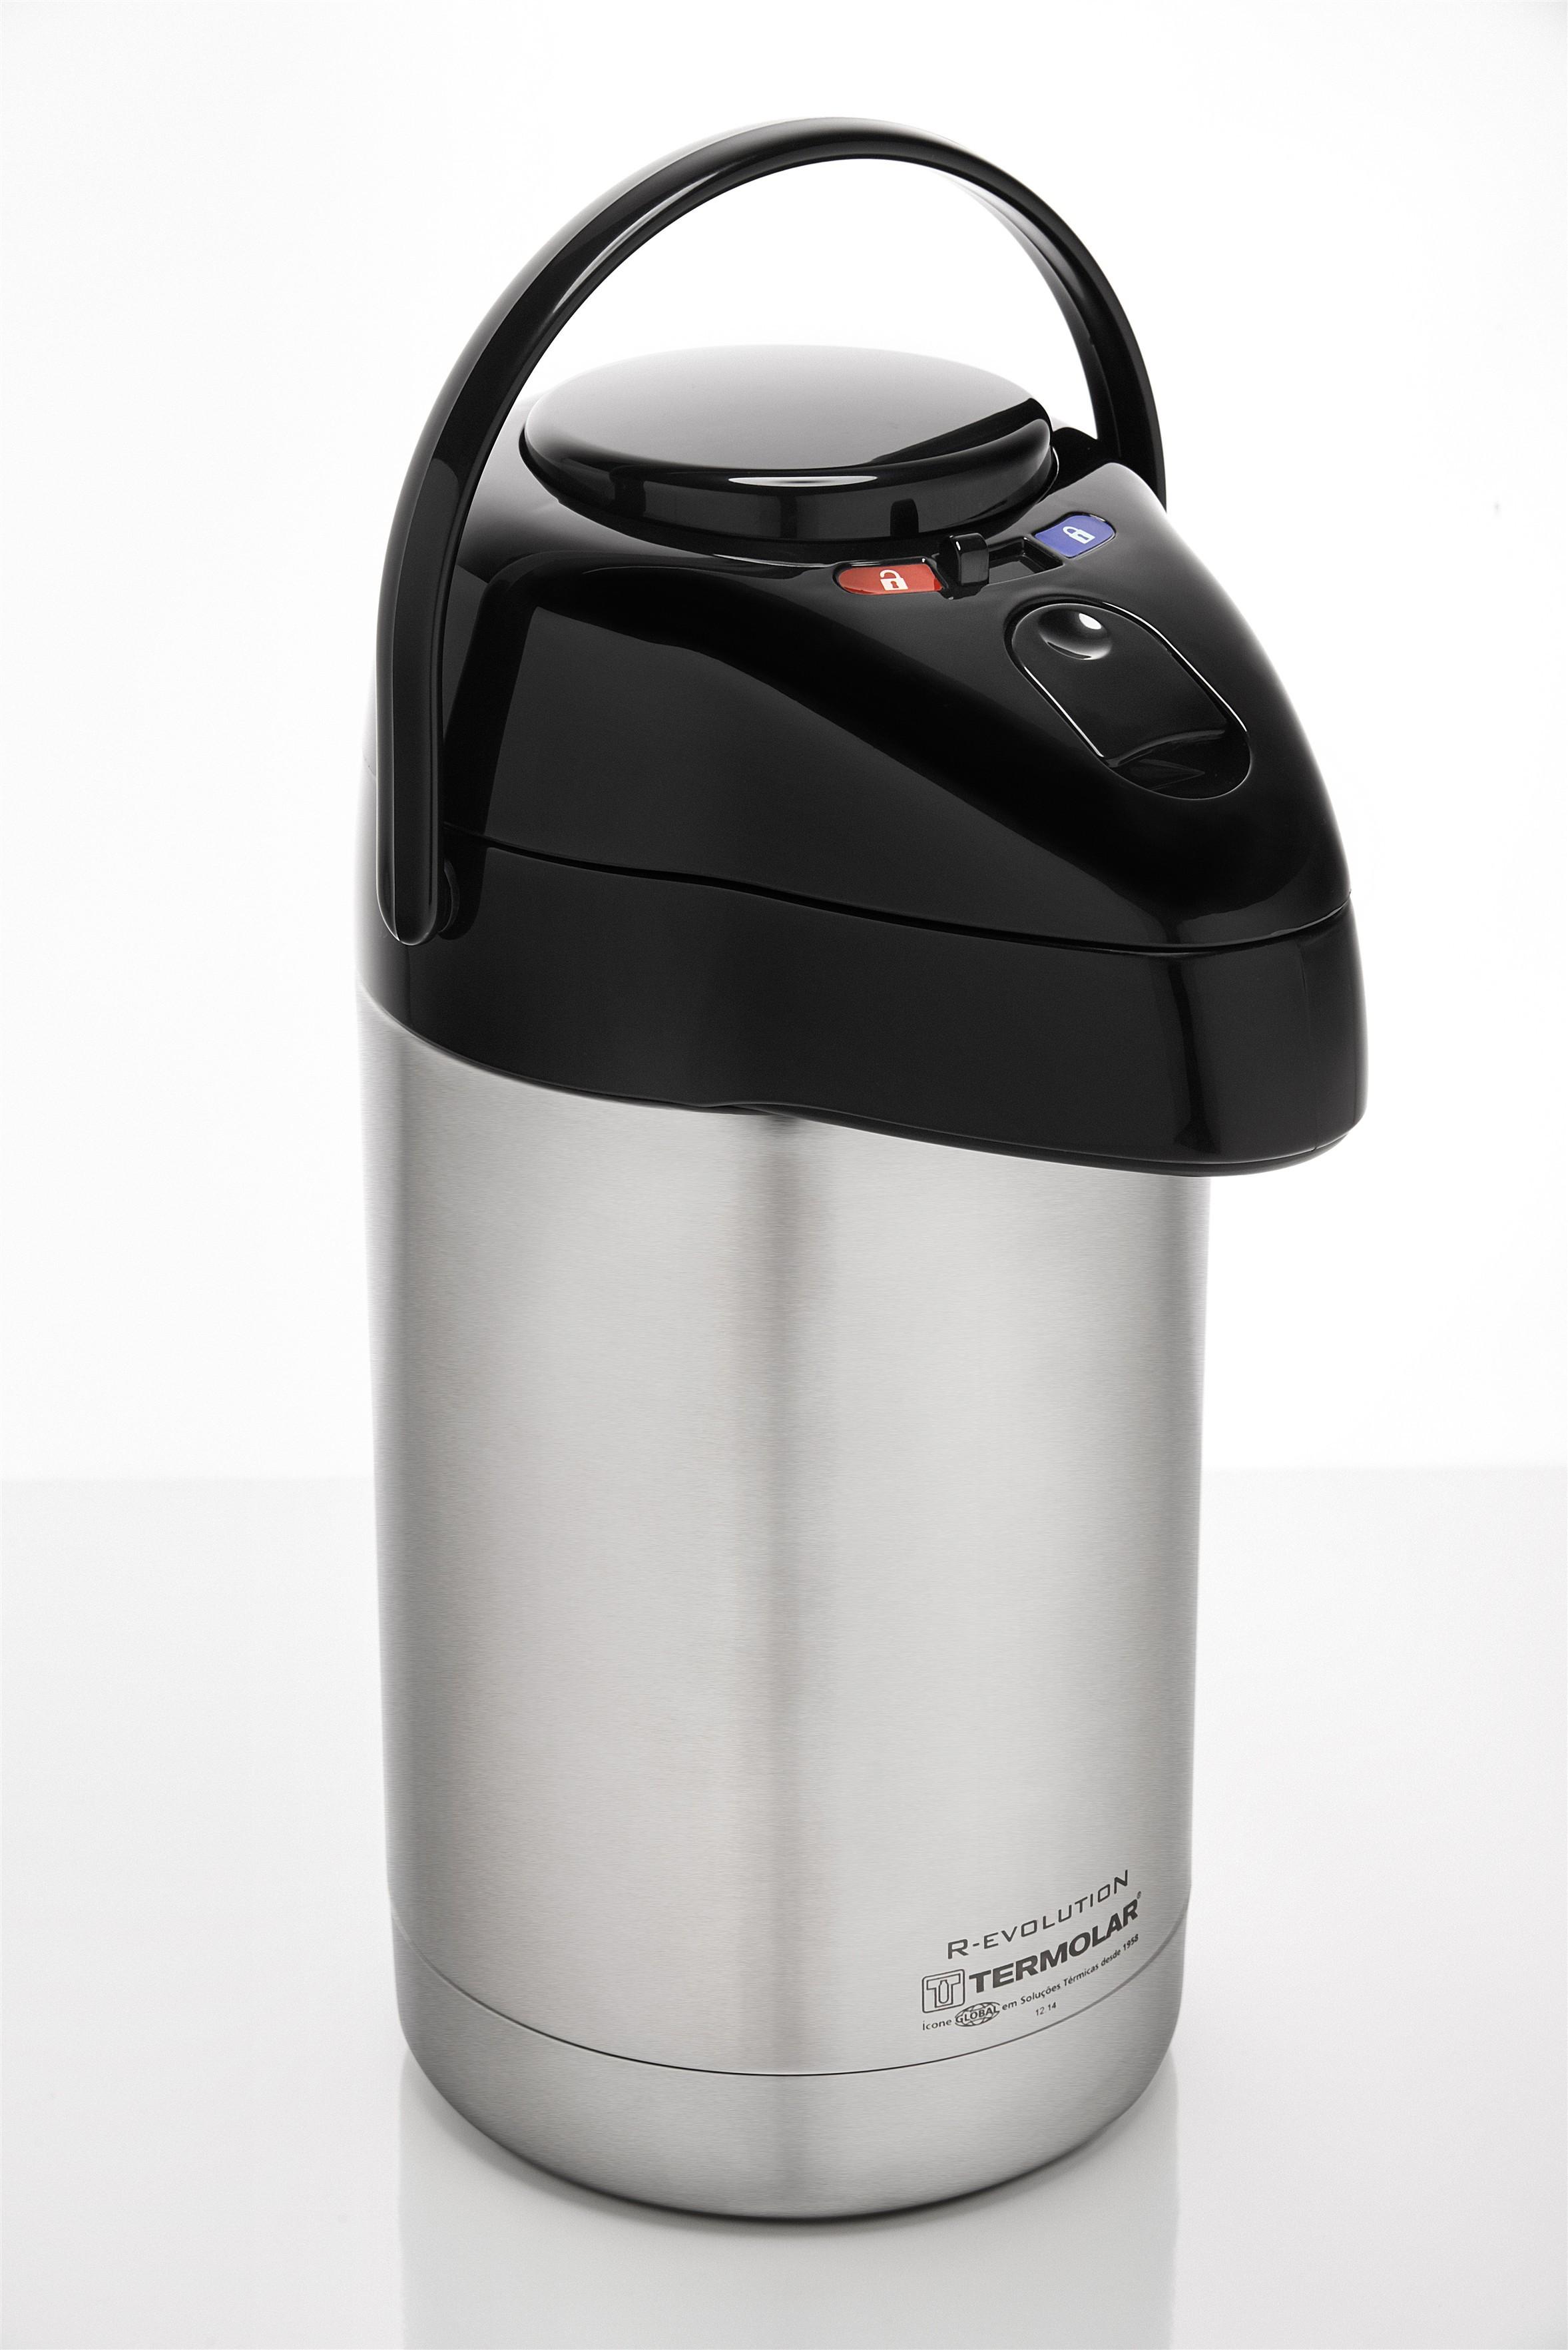 Garrafa Térmica 100% Inox R-Evolution 2.5L - TERMOLAR